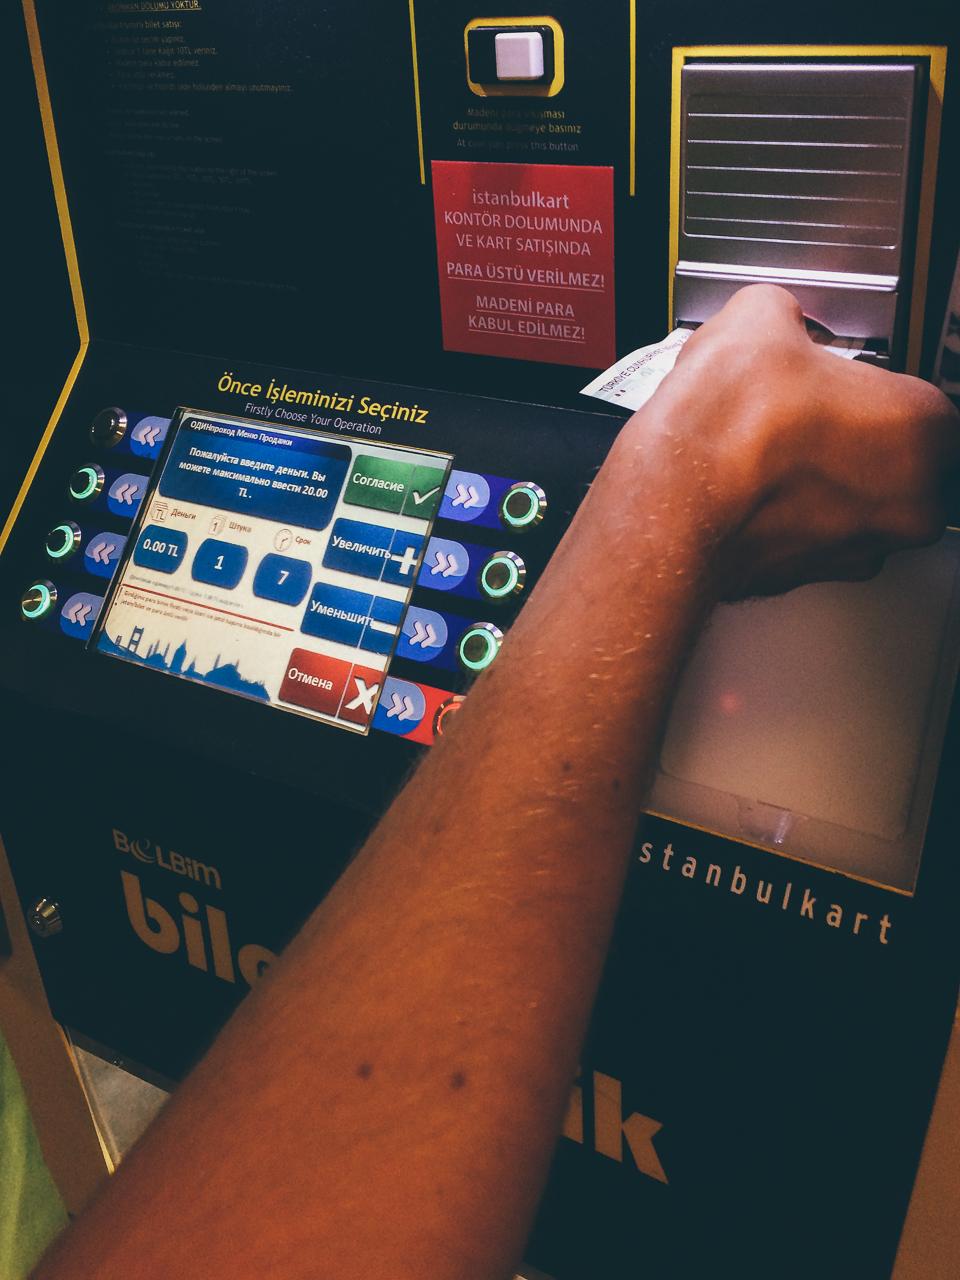 Стоповер в Стамбуле. День 1: Покупка билетов на метро